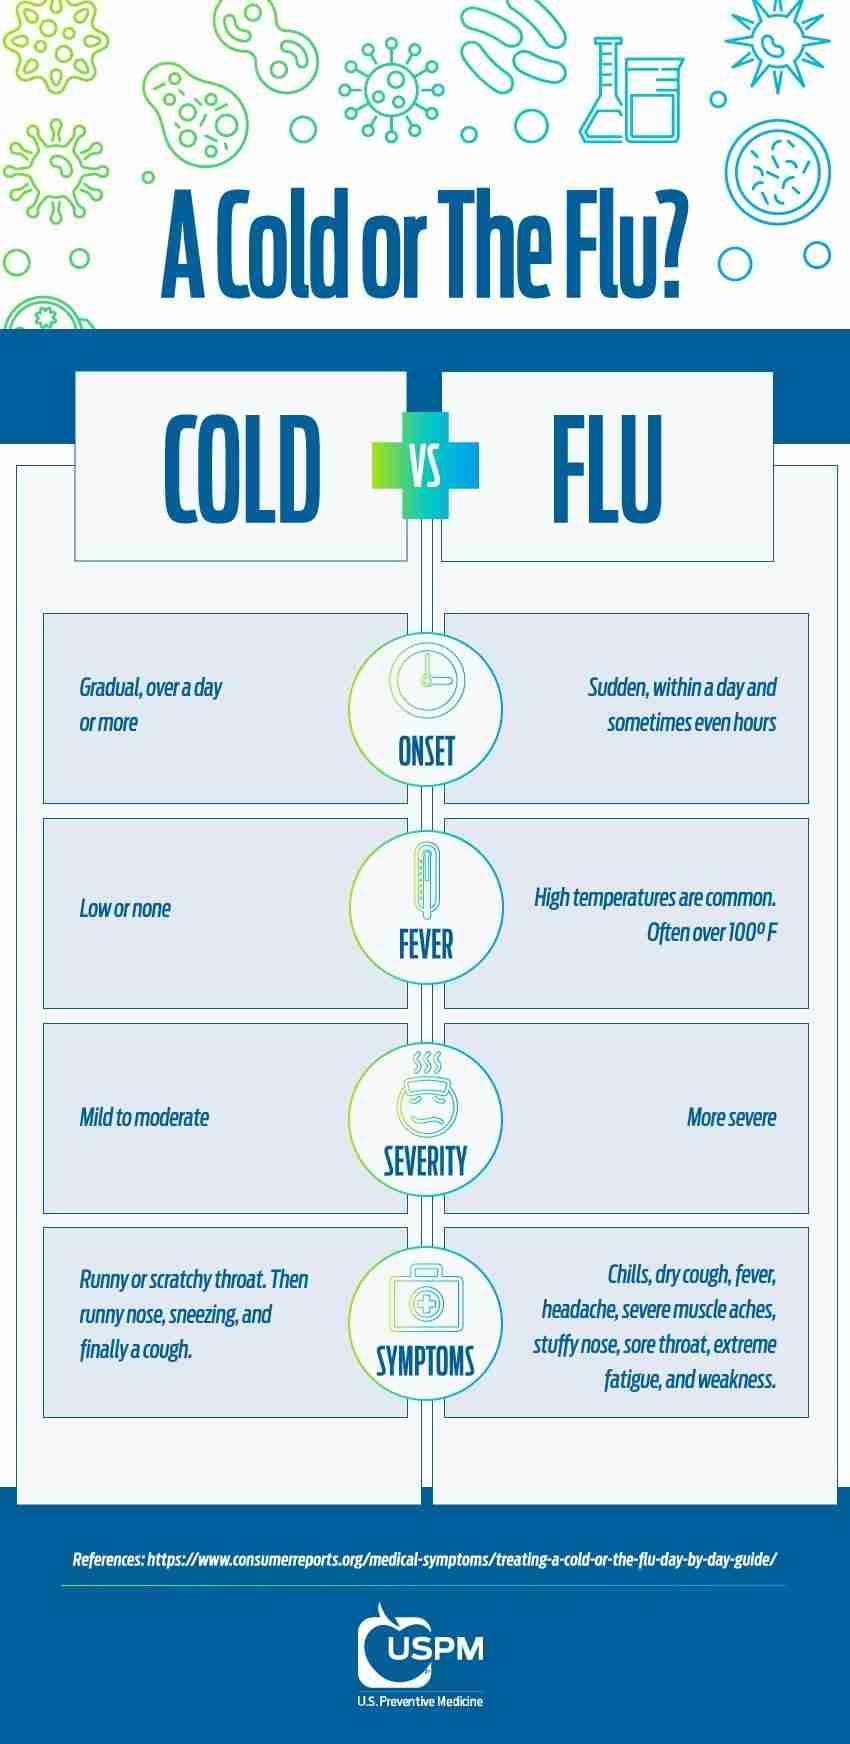 USPM Cold vs Flu Infographic